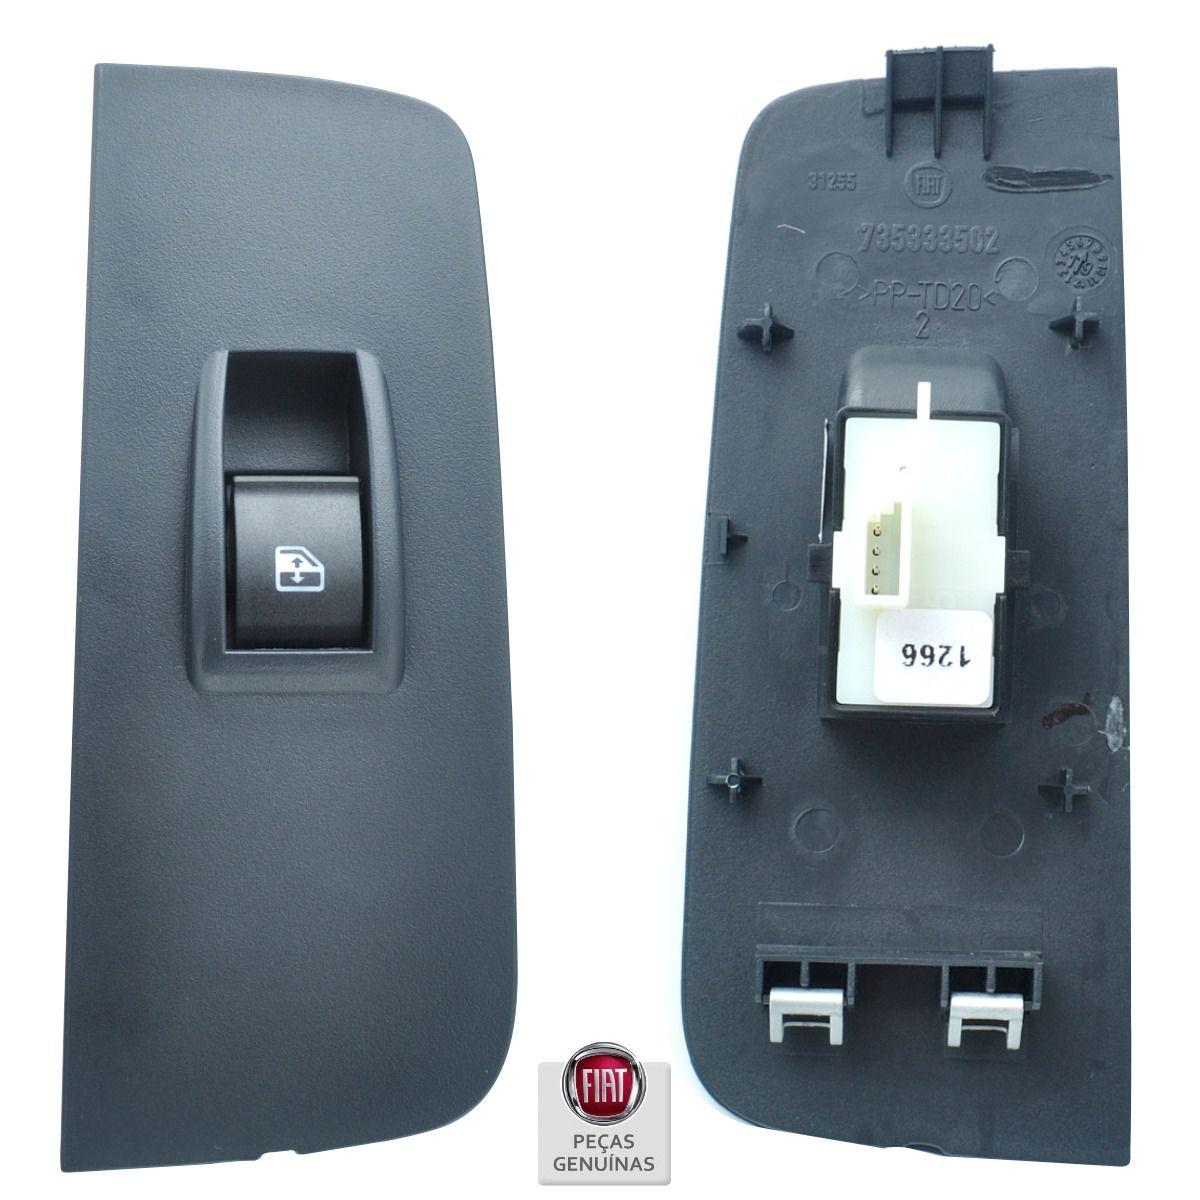 Kit Interruptor Vidro Elétrico 4 Portas Completo - Fiat